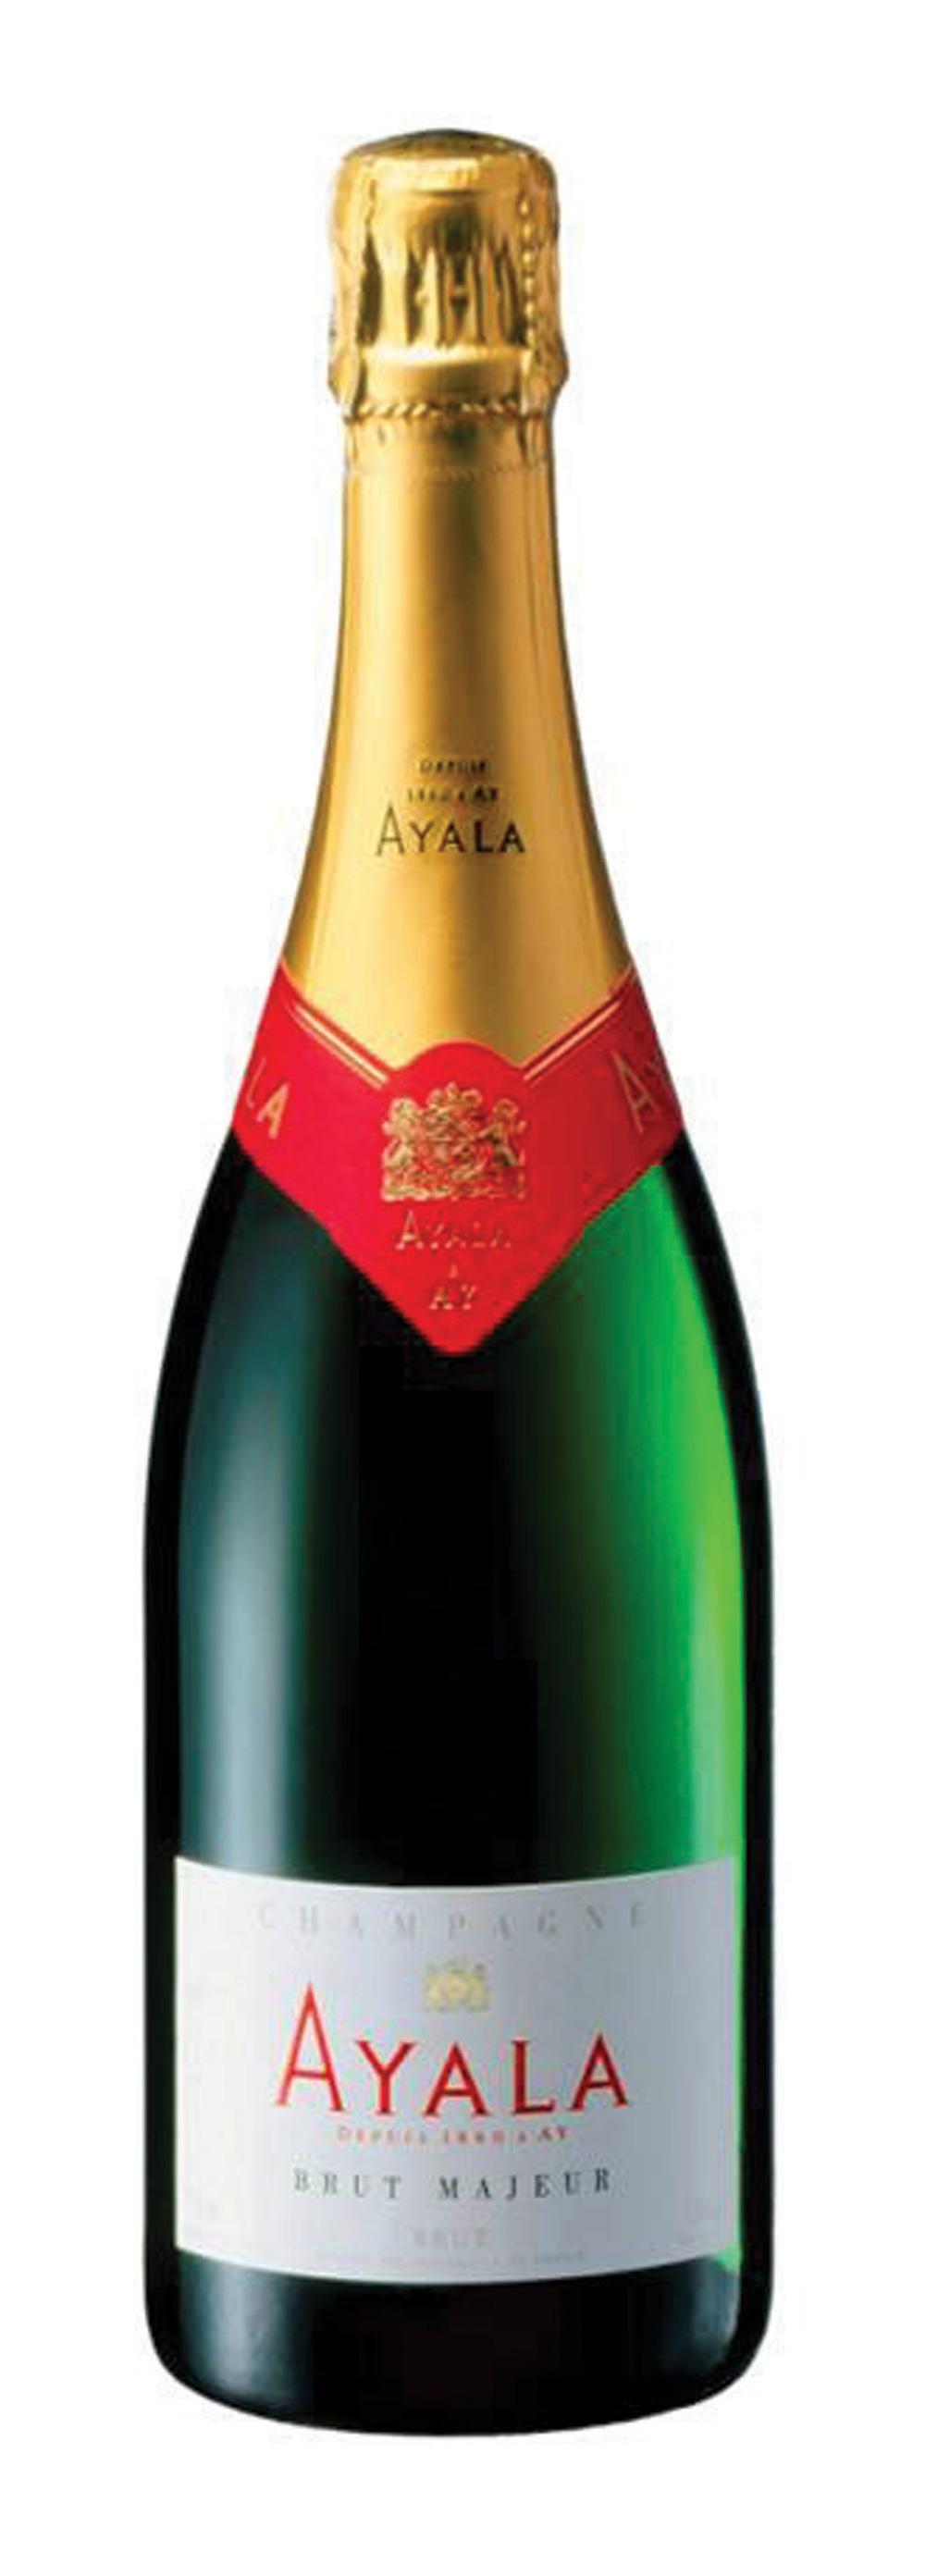 Ayala Brut Majeur Brut Champagne